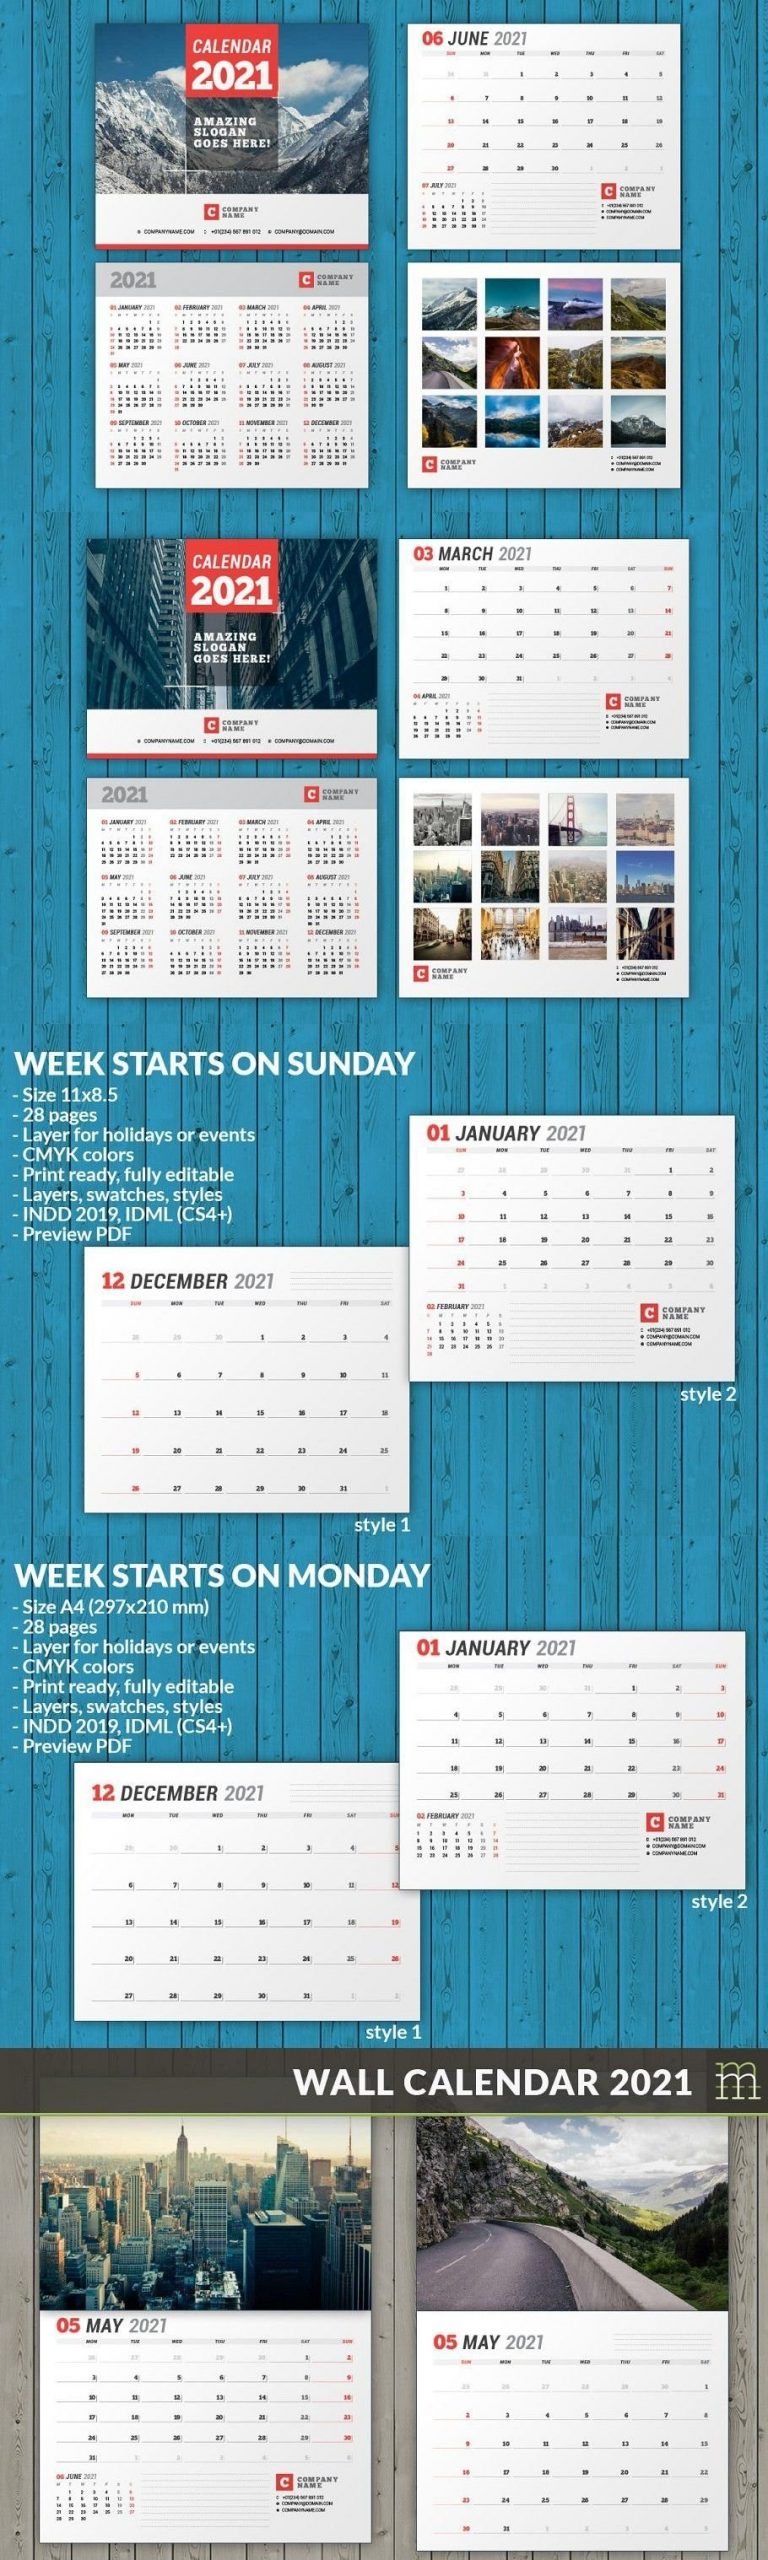 Wall Calendar 2021 (Wc037-21) In 2020 | Wall Calendar, Calendar Template, Calendar 2020 intended for 2021 Indesign Calendar Template Graphics